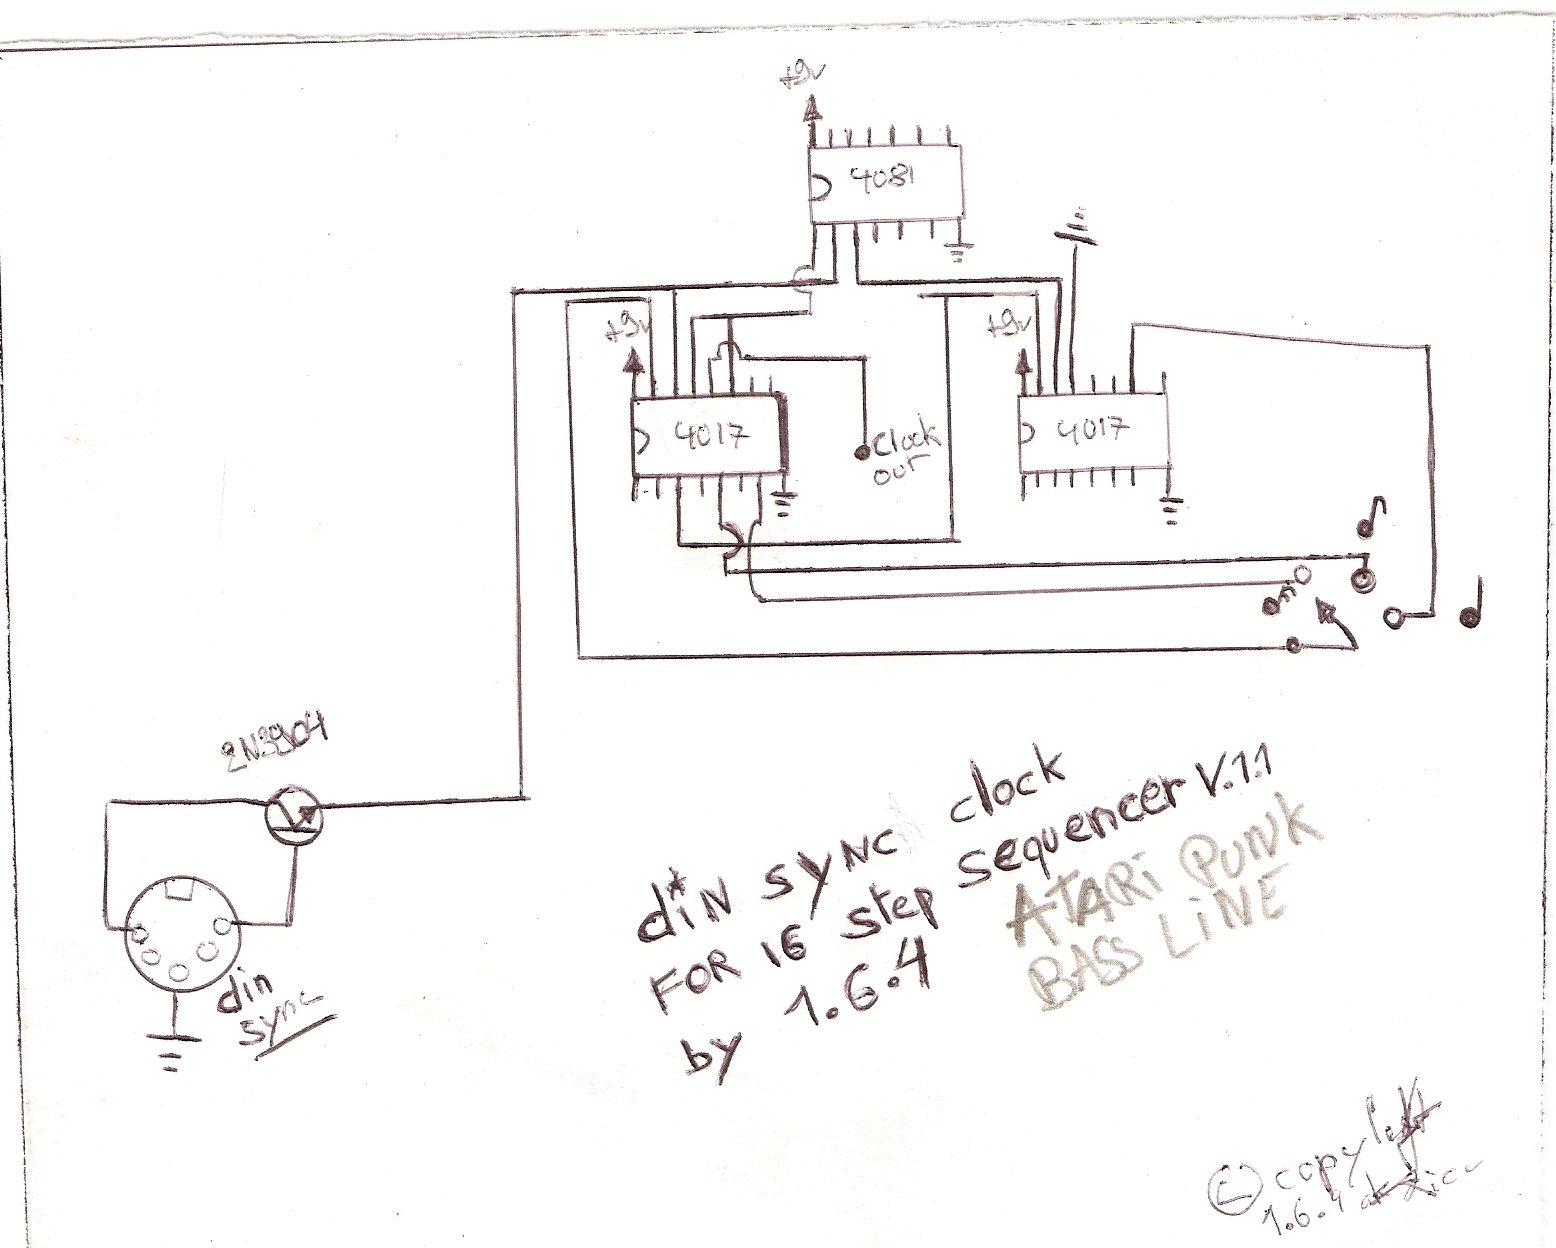 http://codelab.fr/up/atari-punk-bassline-dinc-synch-complete-1.jpg